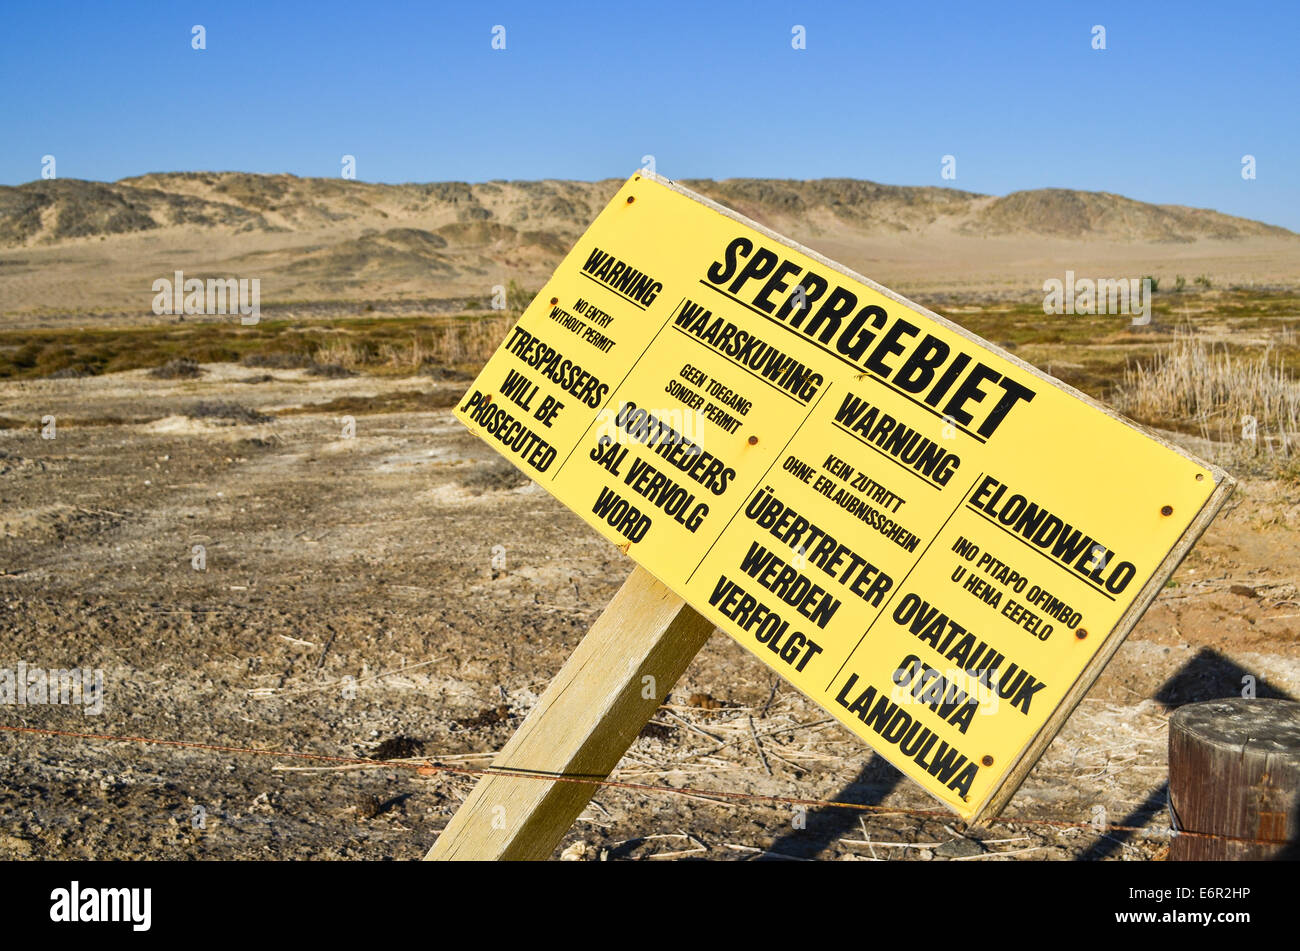 Sperrgebiet warning sign, Diamond mining area 01, Namibia - Stock Image